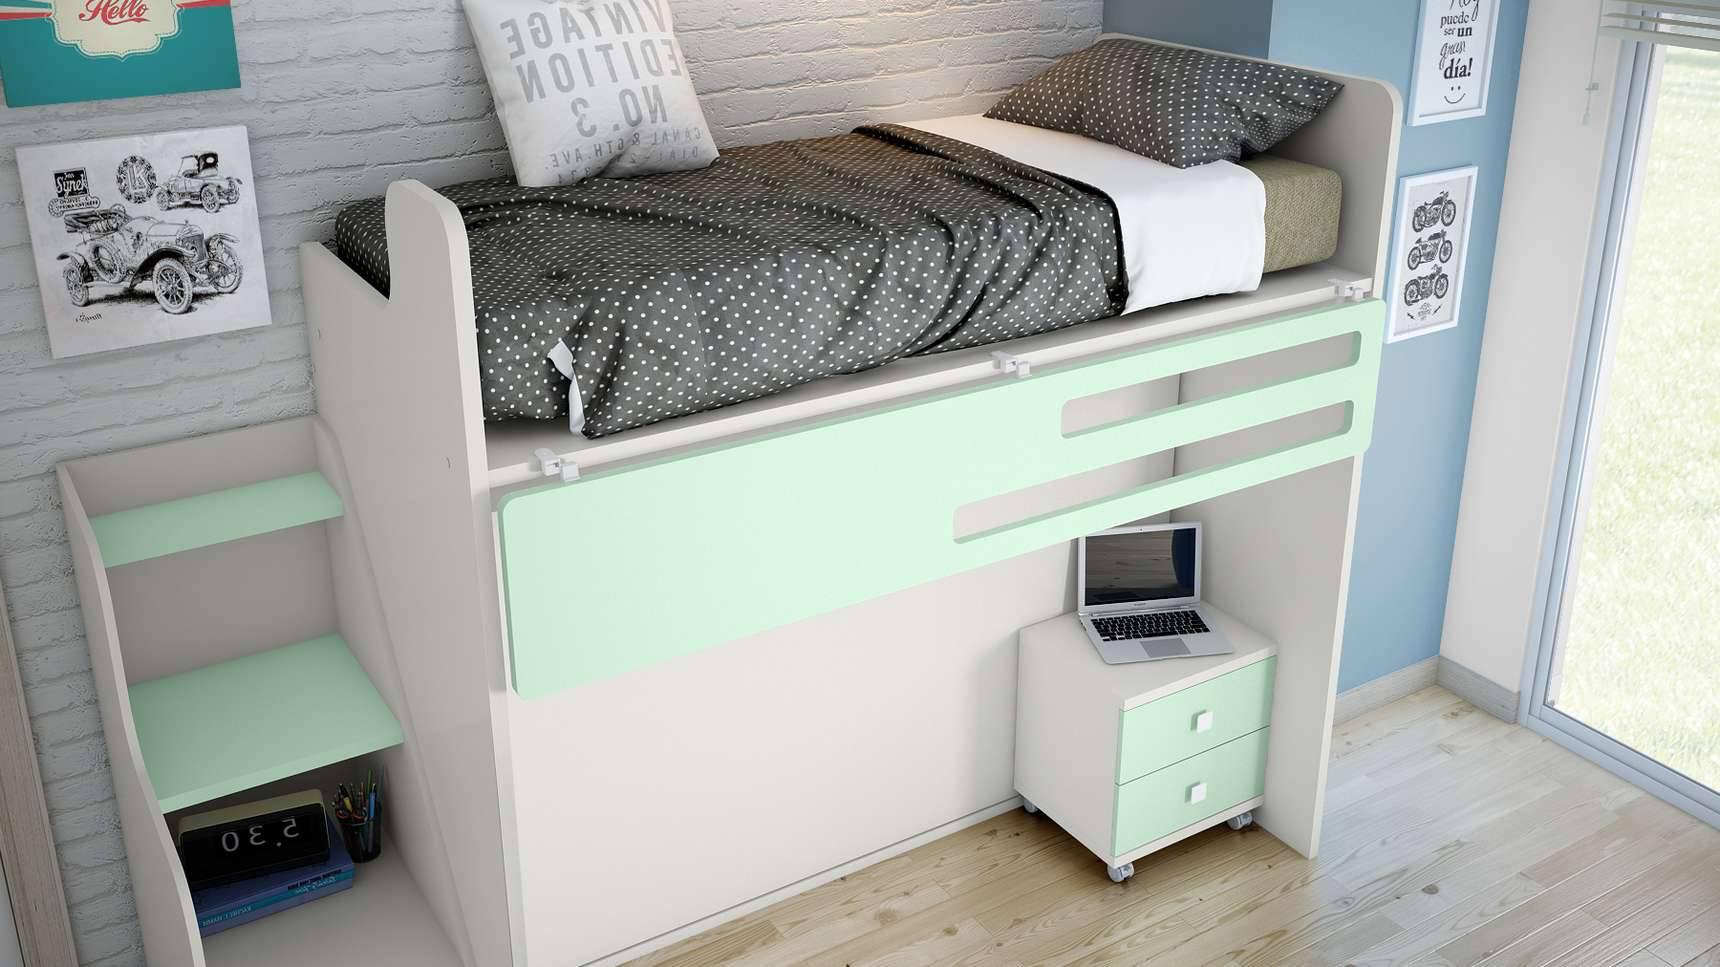 Ideh bita litera con cama abatible - Cama litera abatible ...